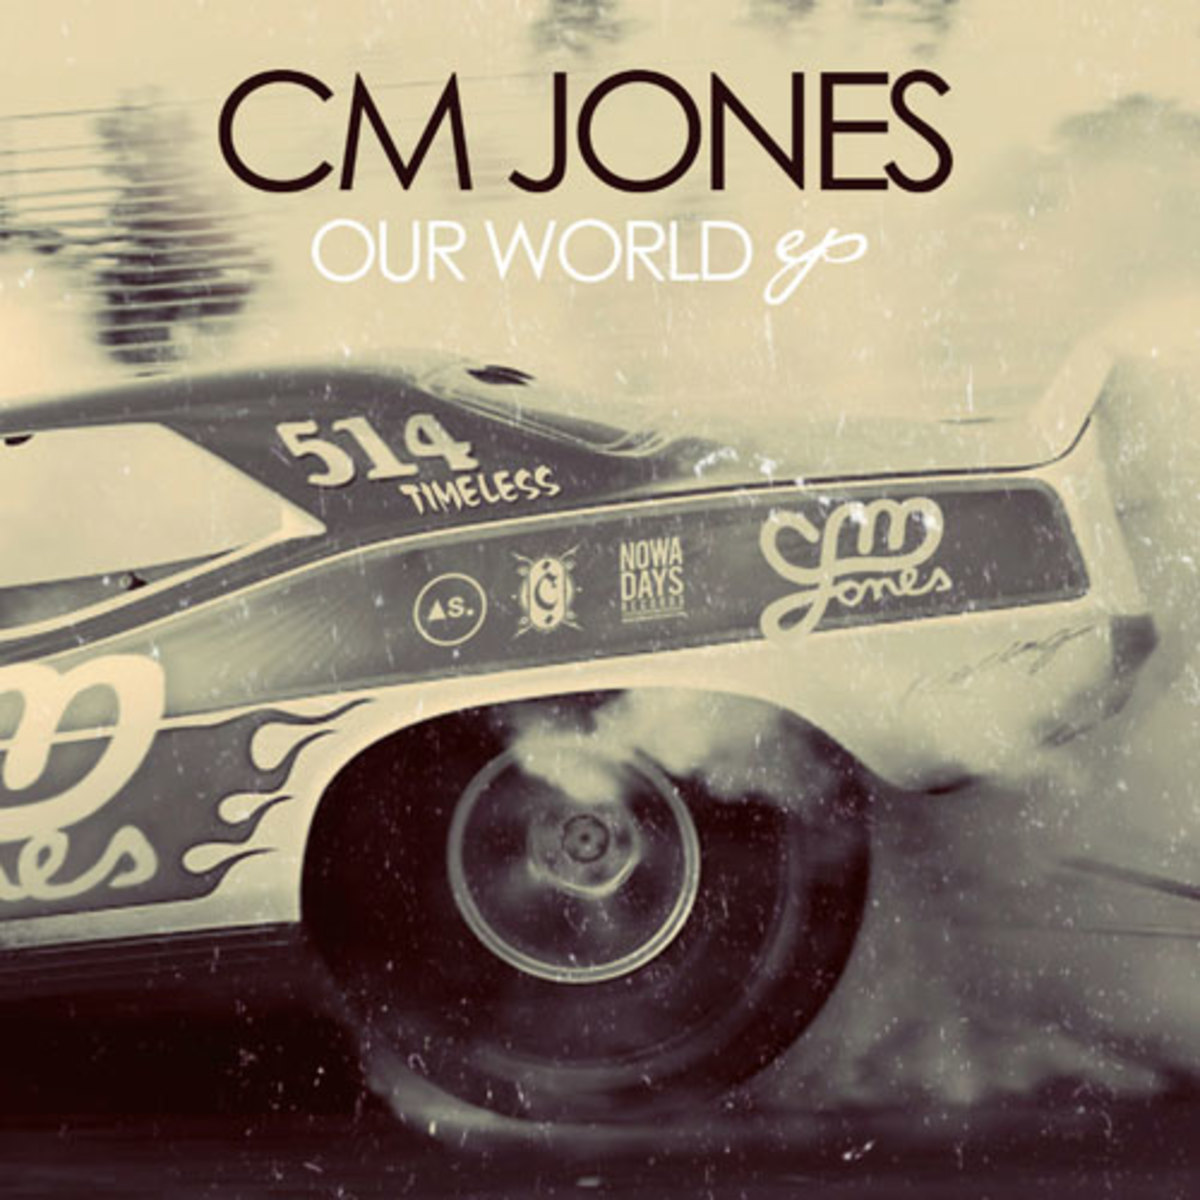 cmjones-ourworld.jpg